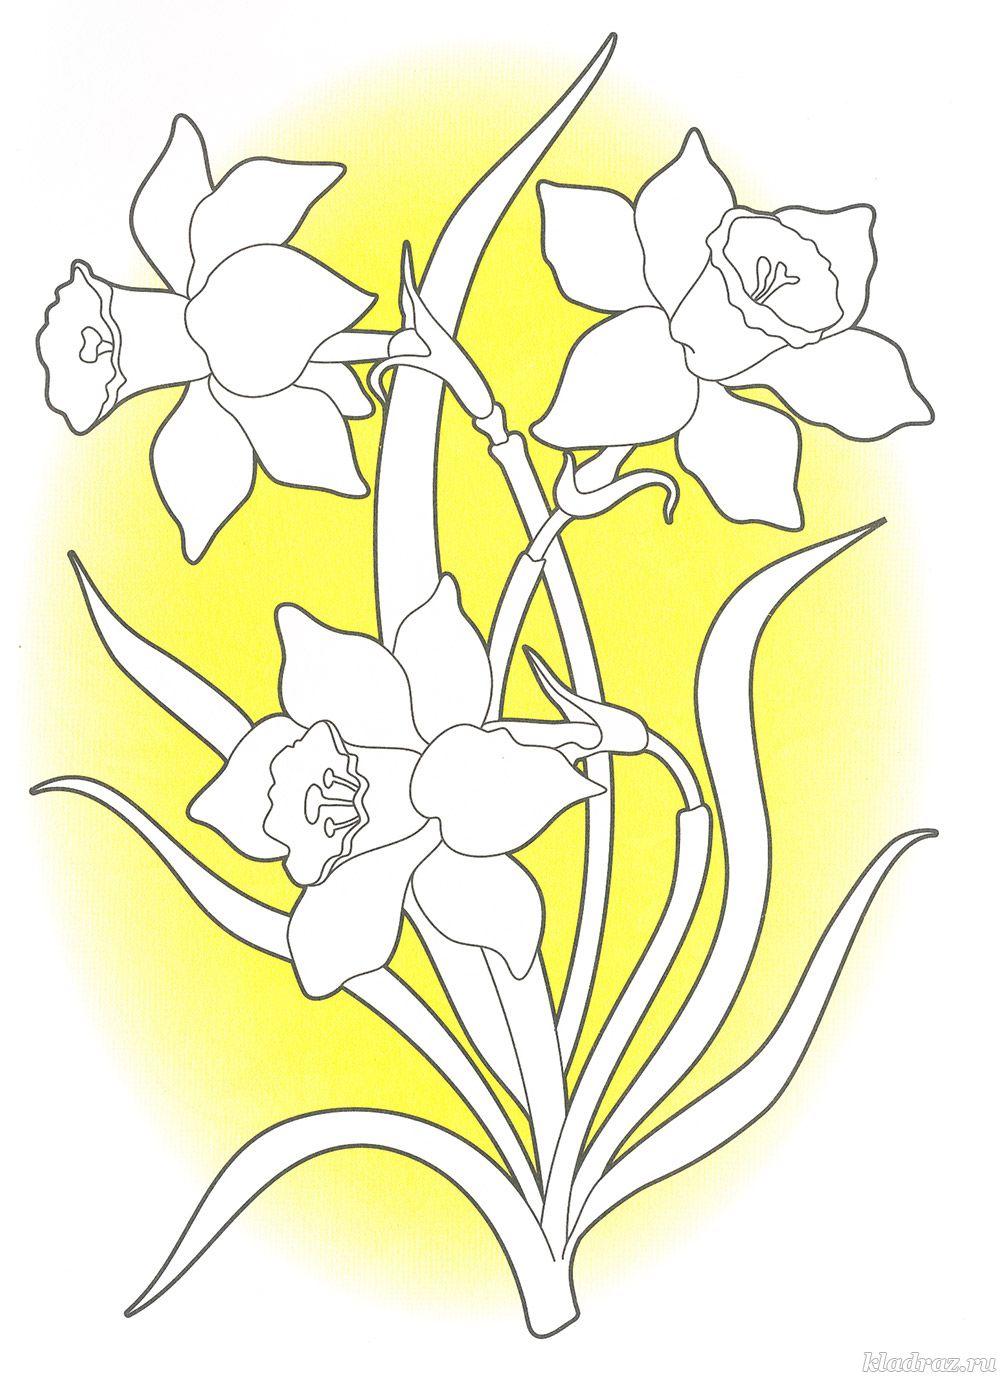 Раскраска цветка нарцисс